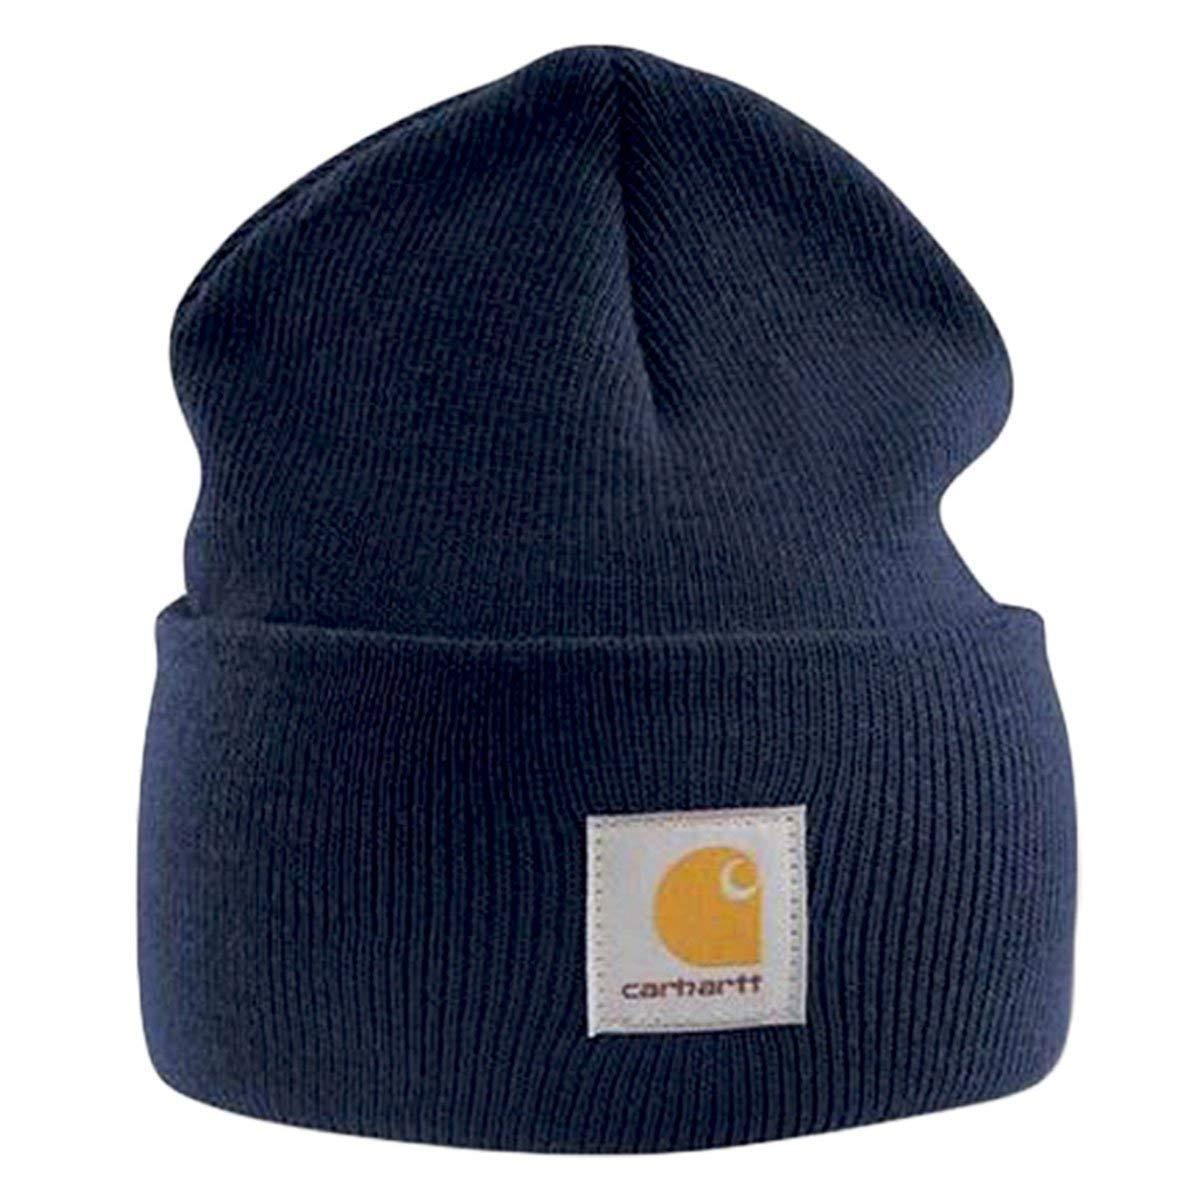 a862558f46a Get Quotations · Carhartt Acrylic Watch Cap - Navy Mens Winter Work Beanie  Ski Hat